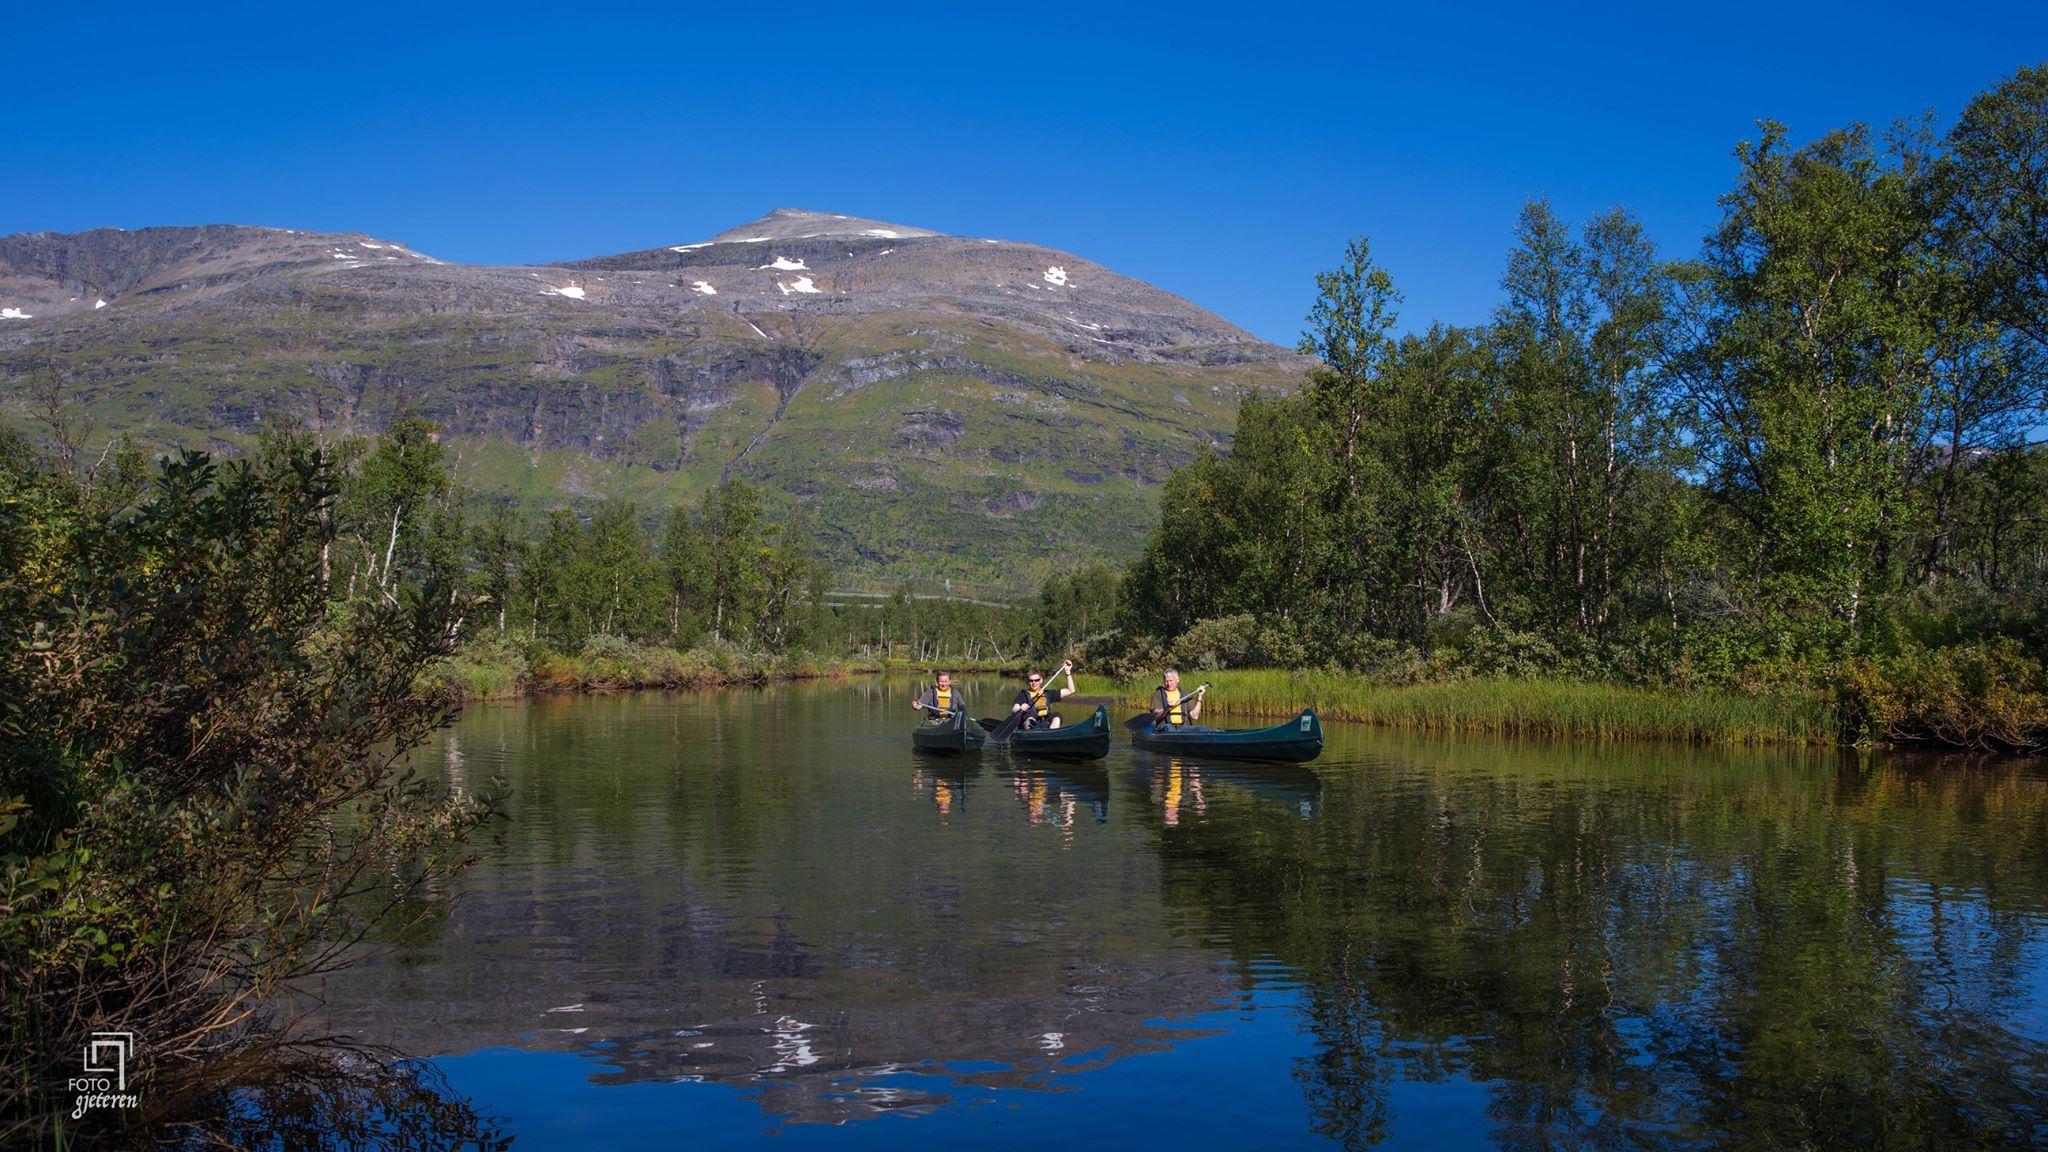 Guided canoeing through the wetland Stormyra